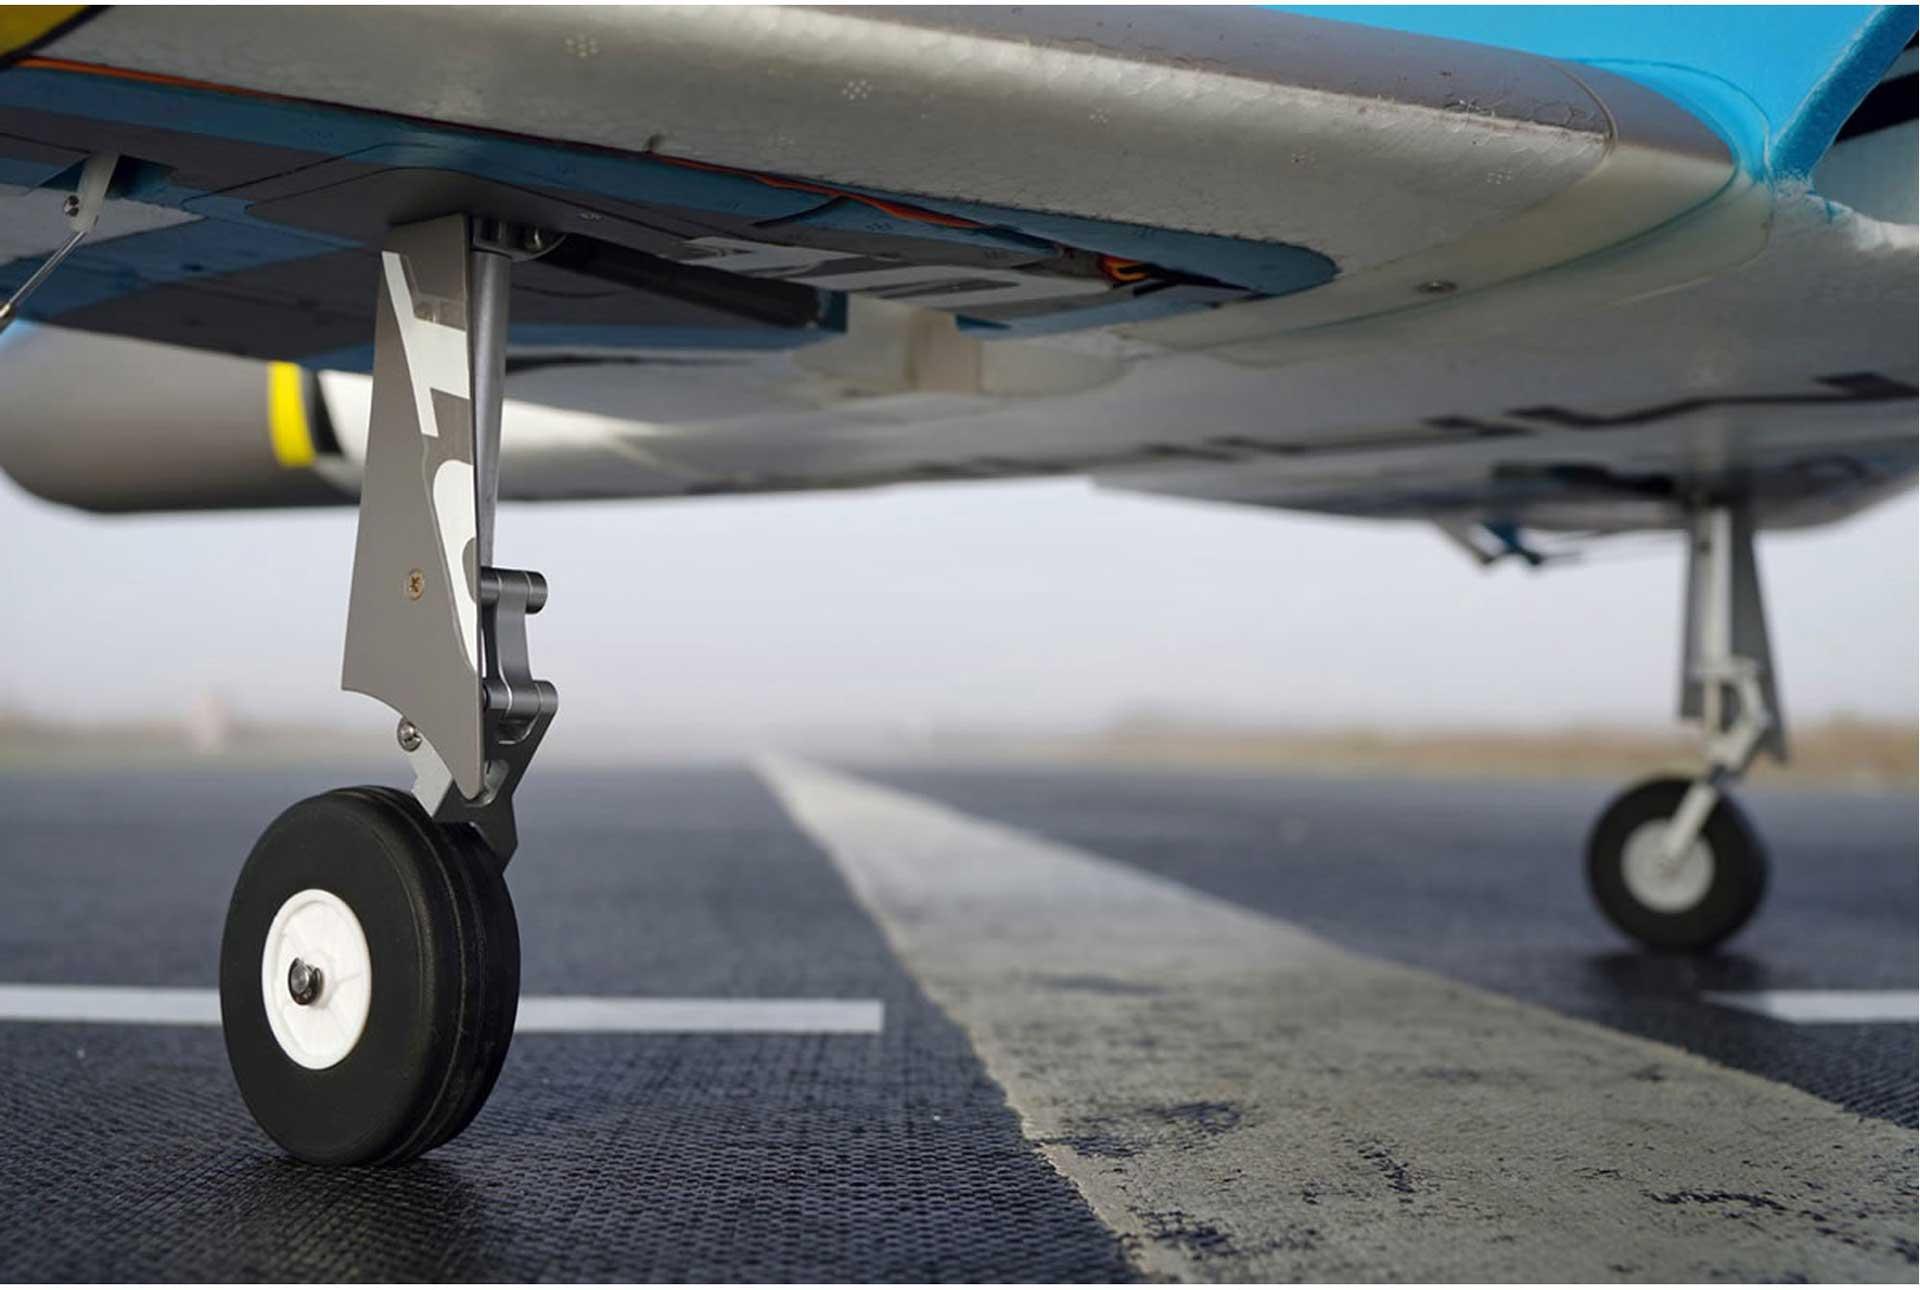 FMS Futura V2 Jet EDF 80 PNP - 106 cm - Blue -Combo incl. Reflex Gyro System